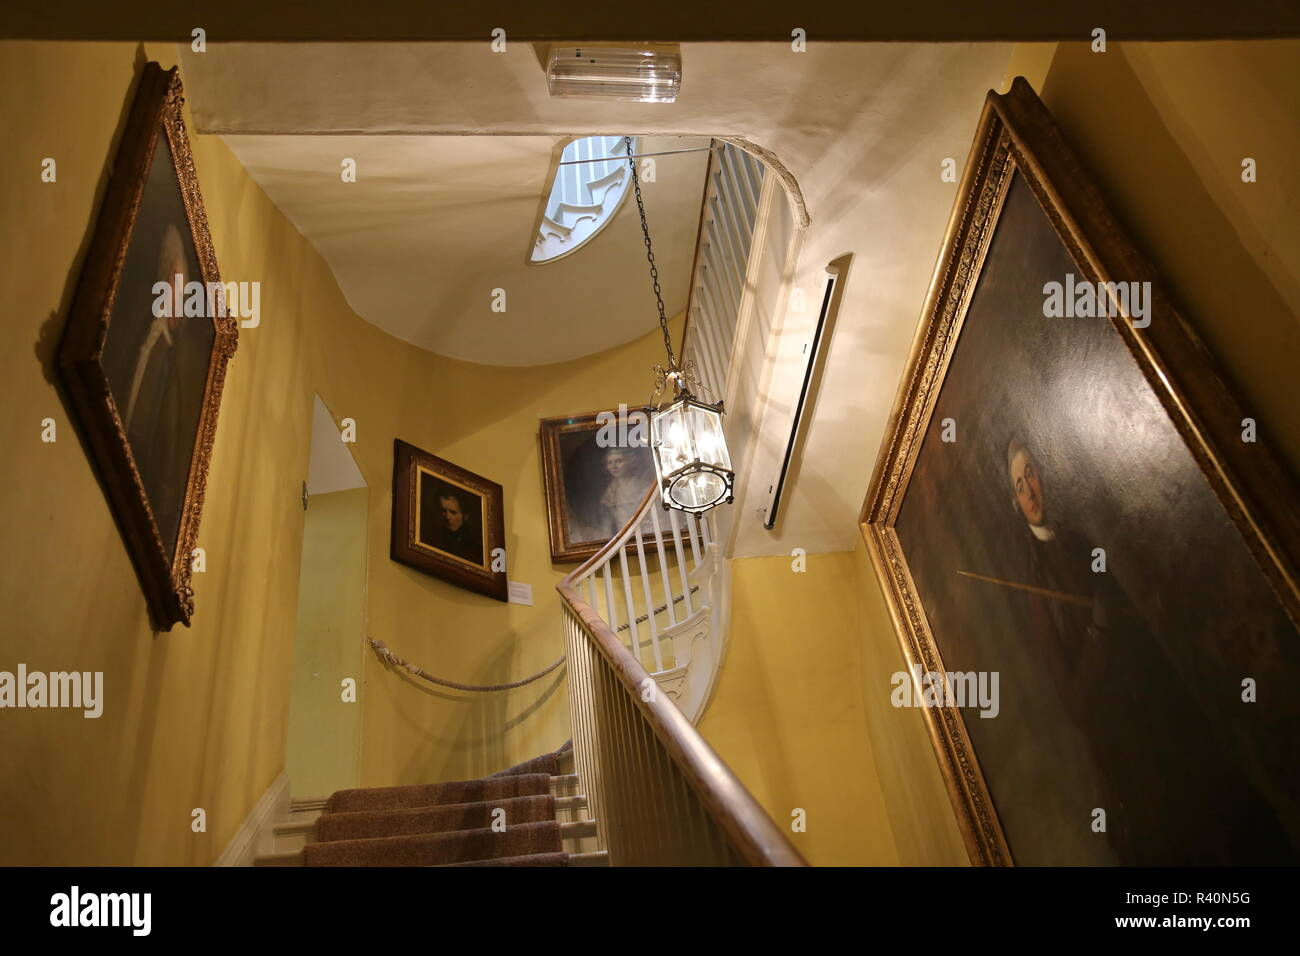 Gainsborough's House museum, Gainsborough Street, Sudbury, Babergh district, Suffolk, East Anglia, England, Great Britain, United Kingdom, UK, Europe - Stock Image